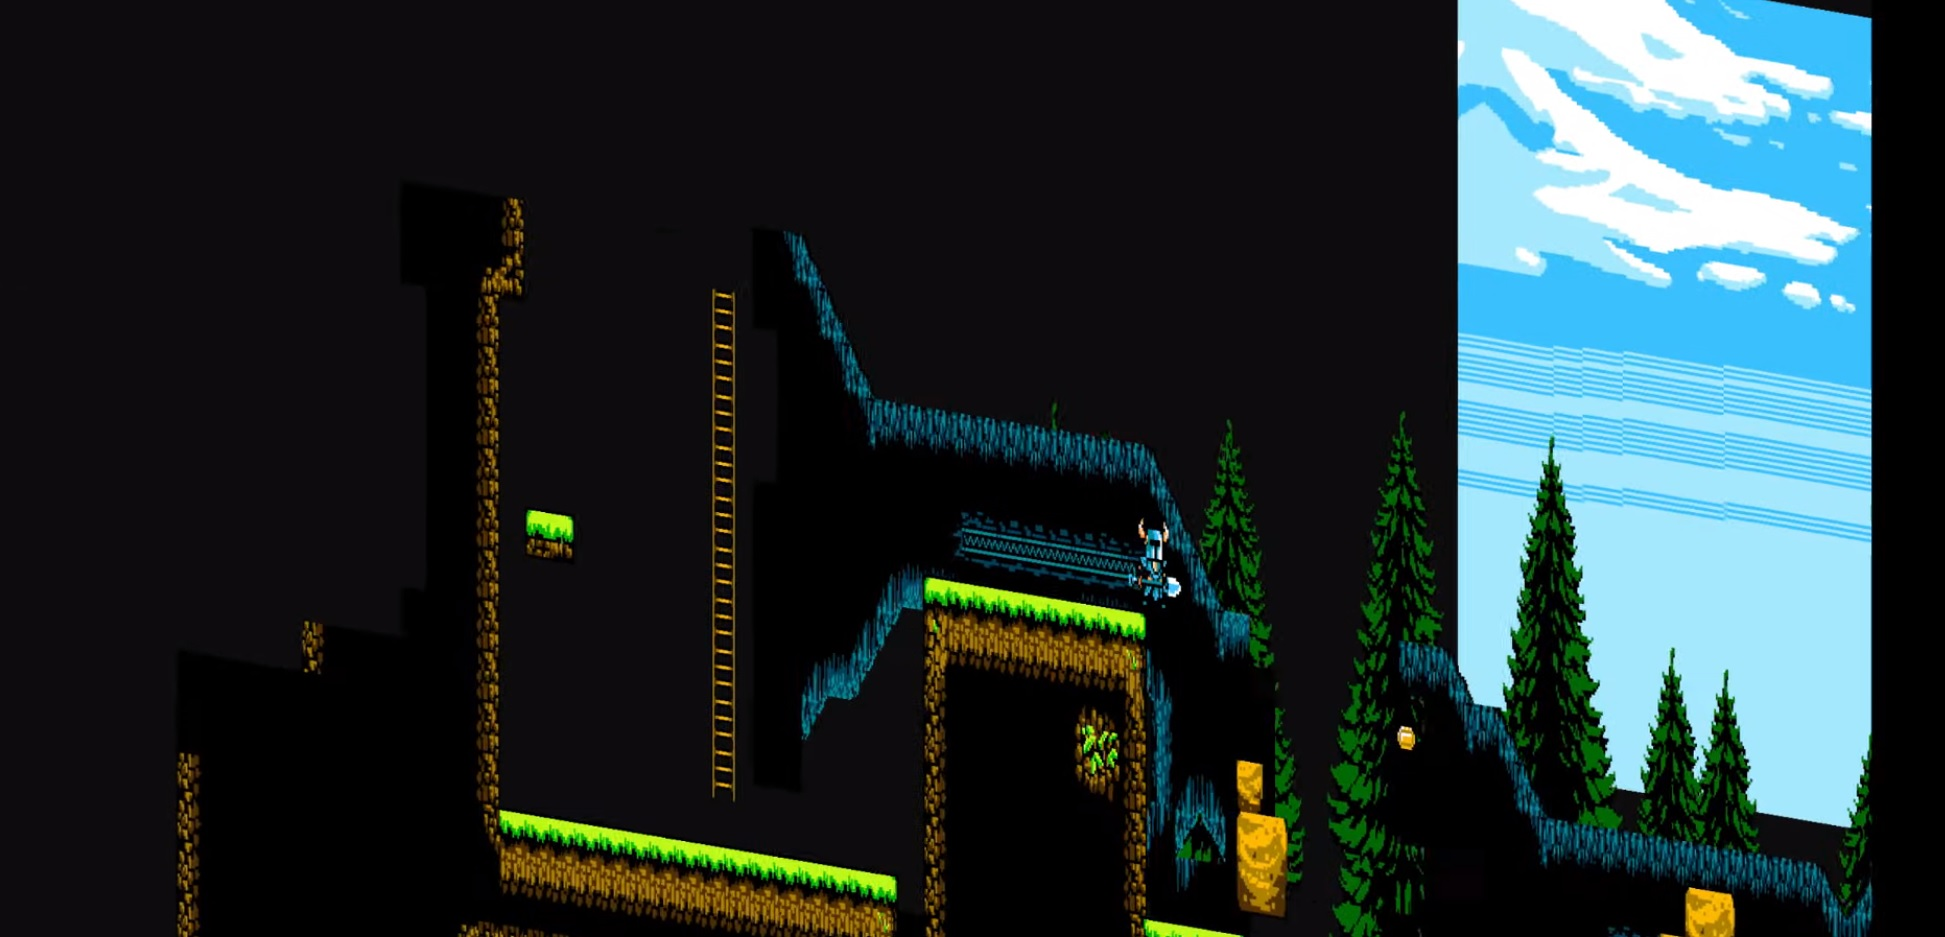 Seemingly 2D platformer Shovel Knight is secretly run with a 3D engine